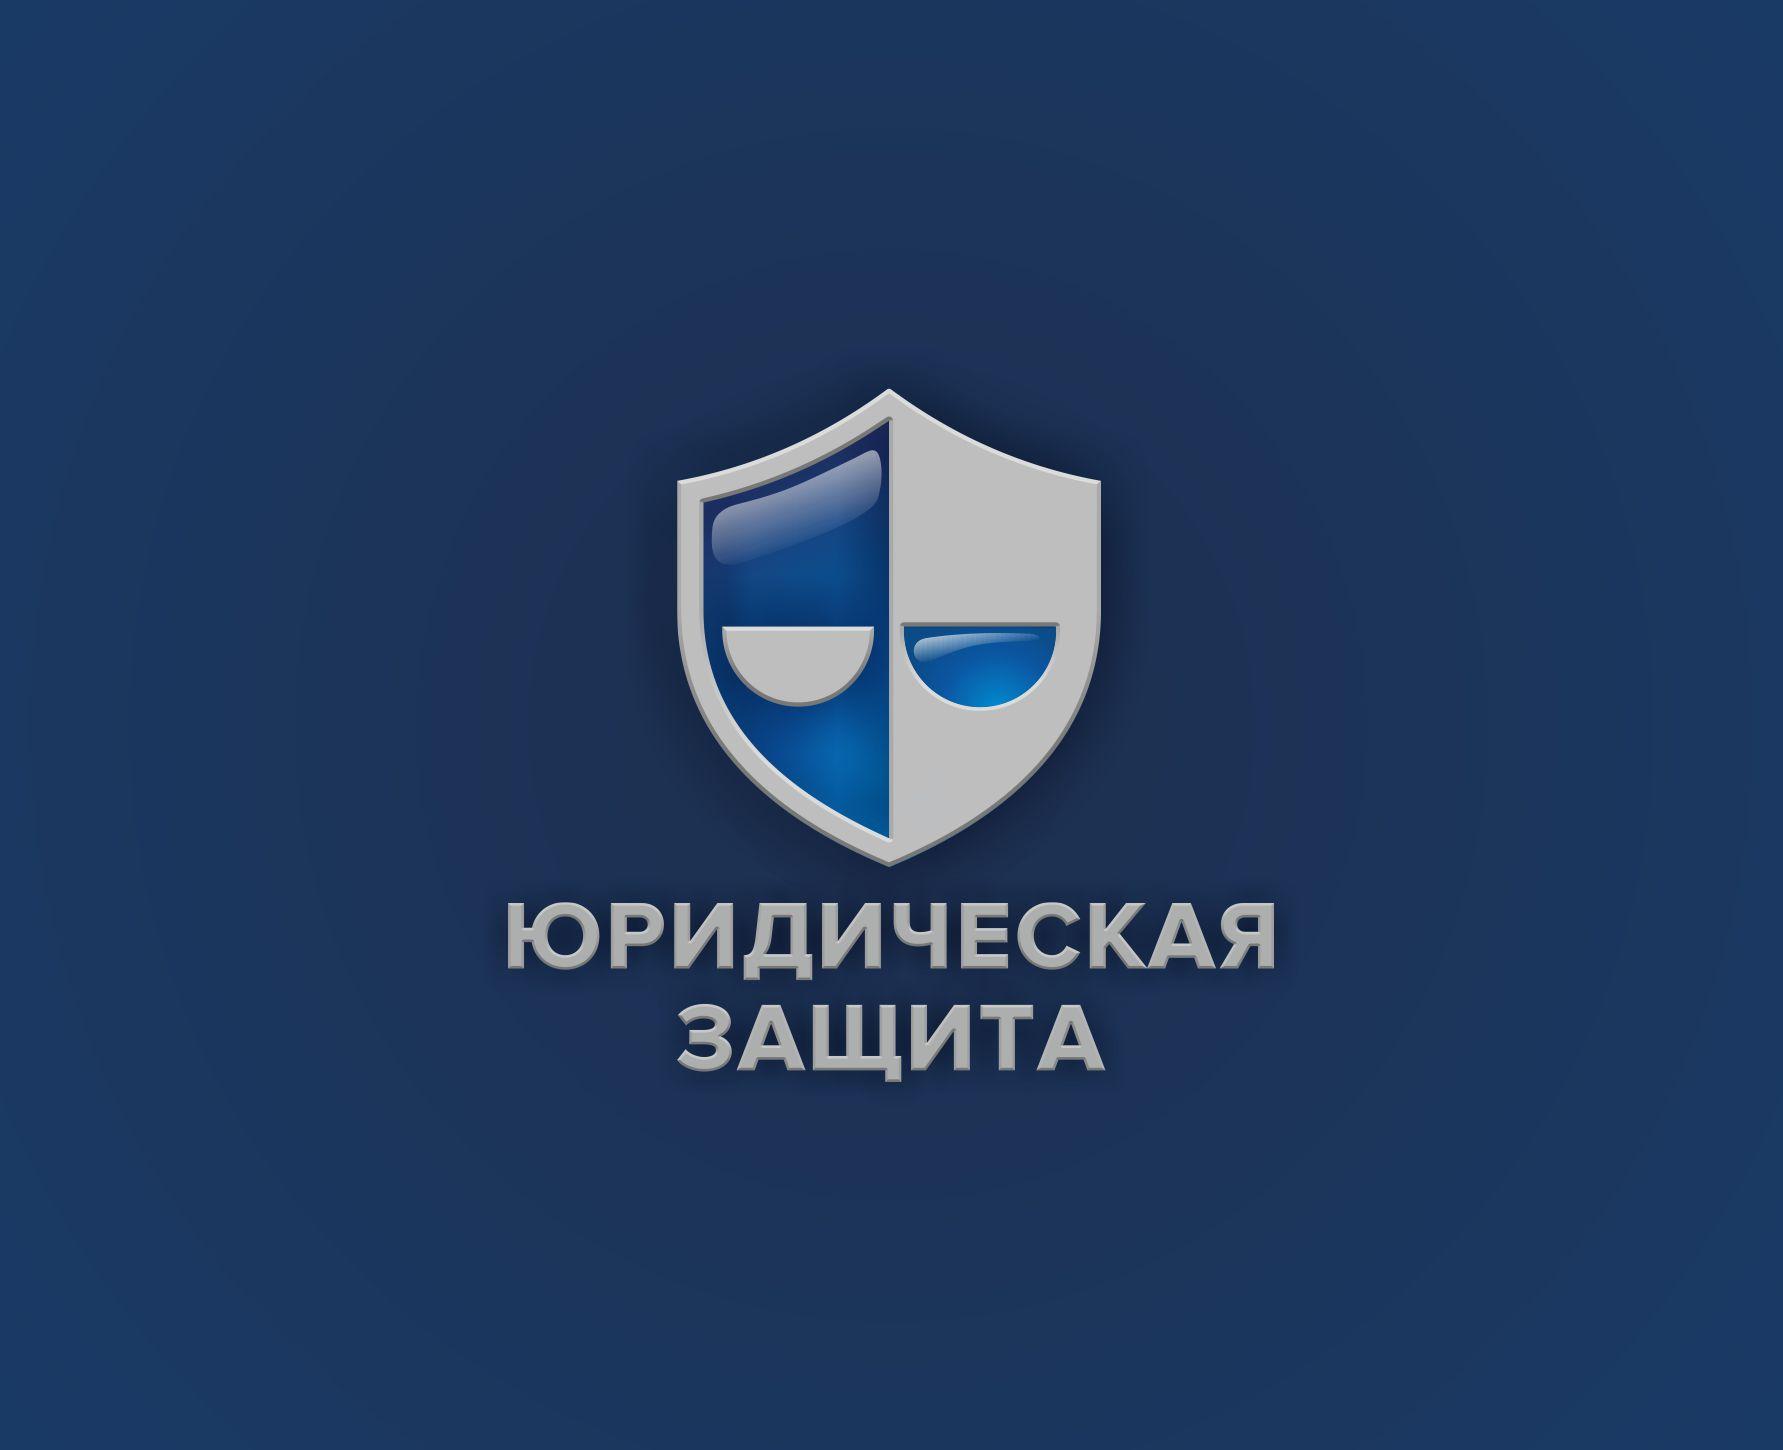 Разработка логотипа для юридической компании фото f_92655dbcd47099dc.jpg